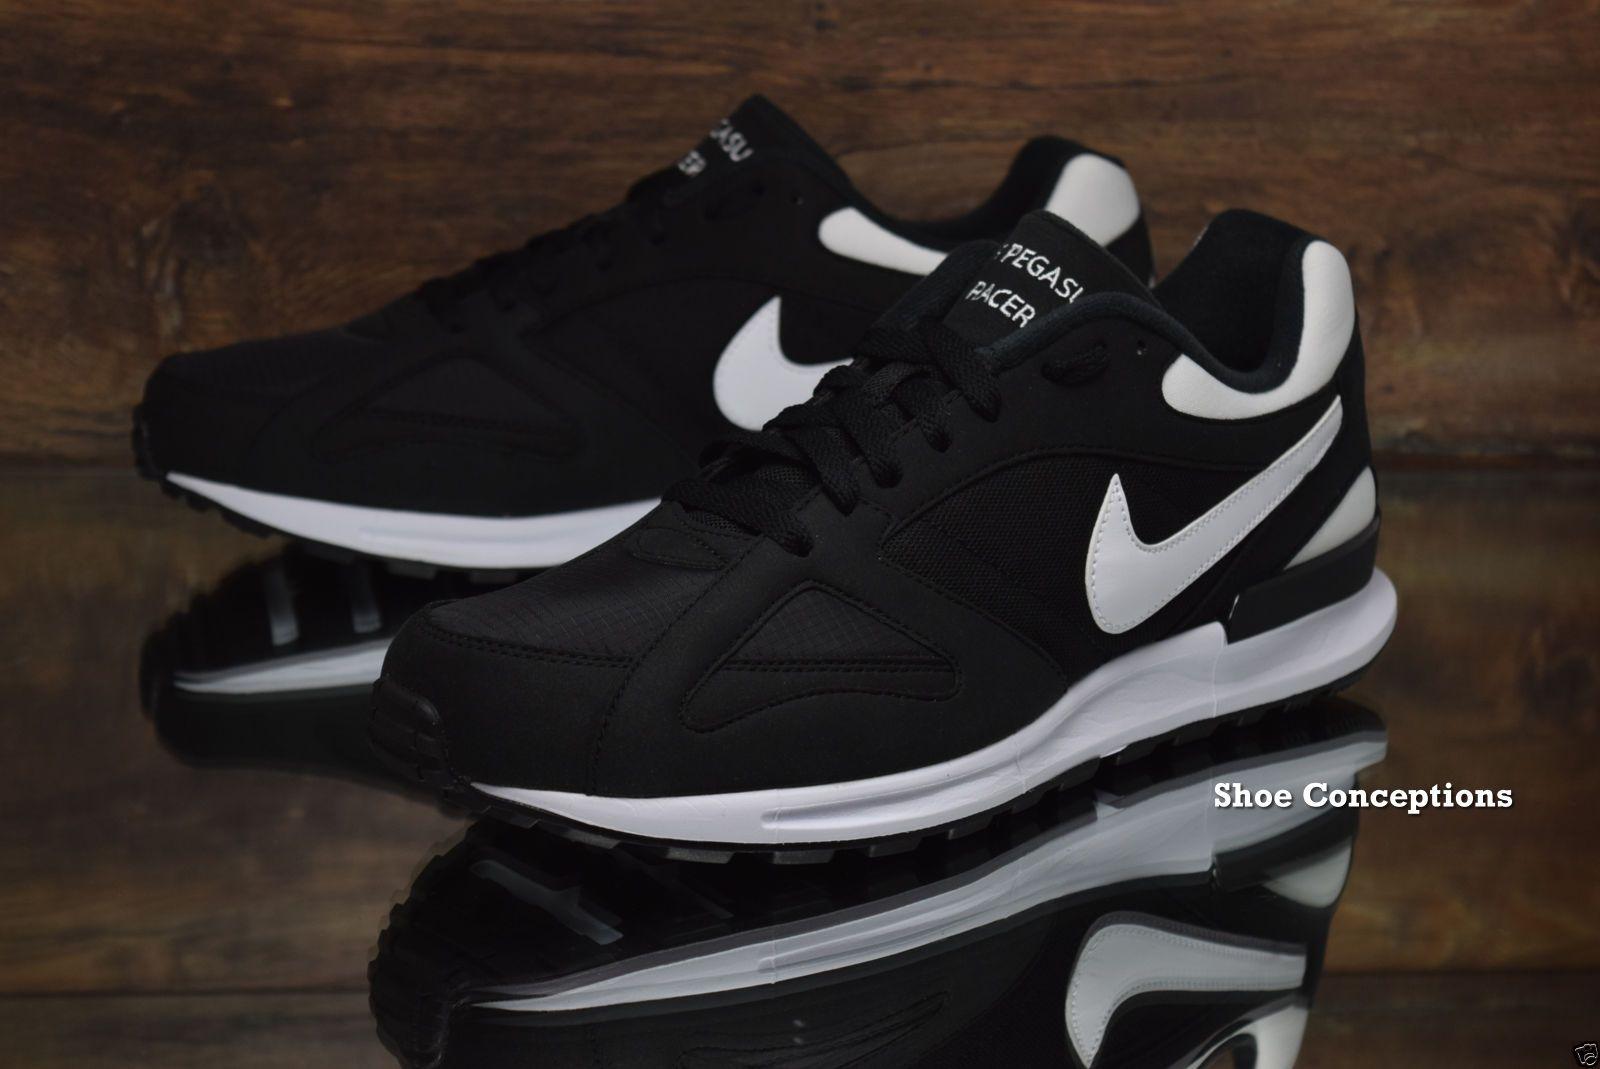 af630707f5711 Nike Air Pegasus New Racer Black White 705172-001 NEW Mens Shoes Multi Size